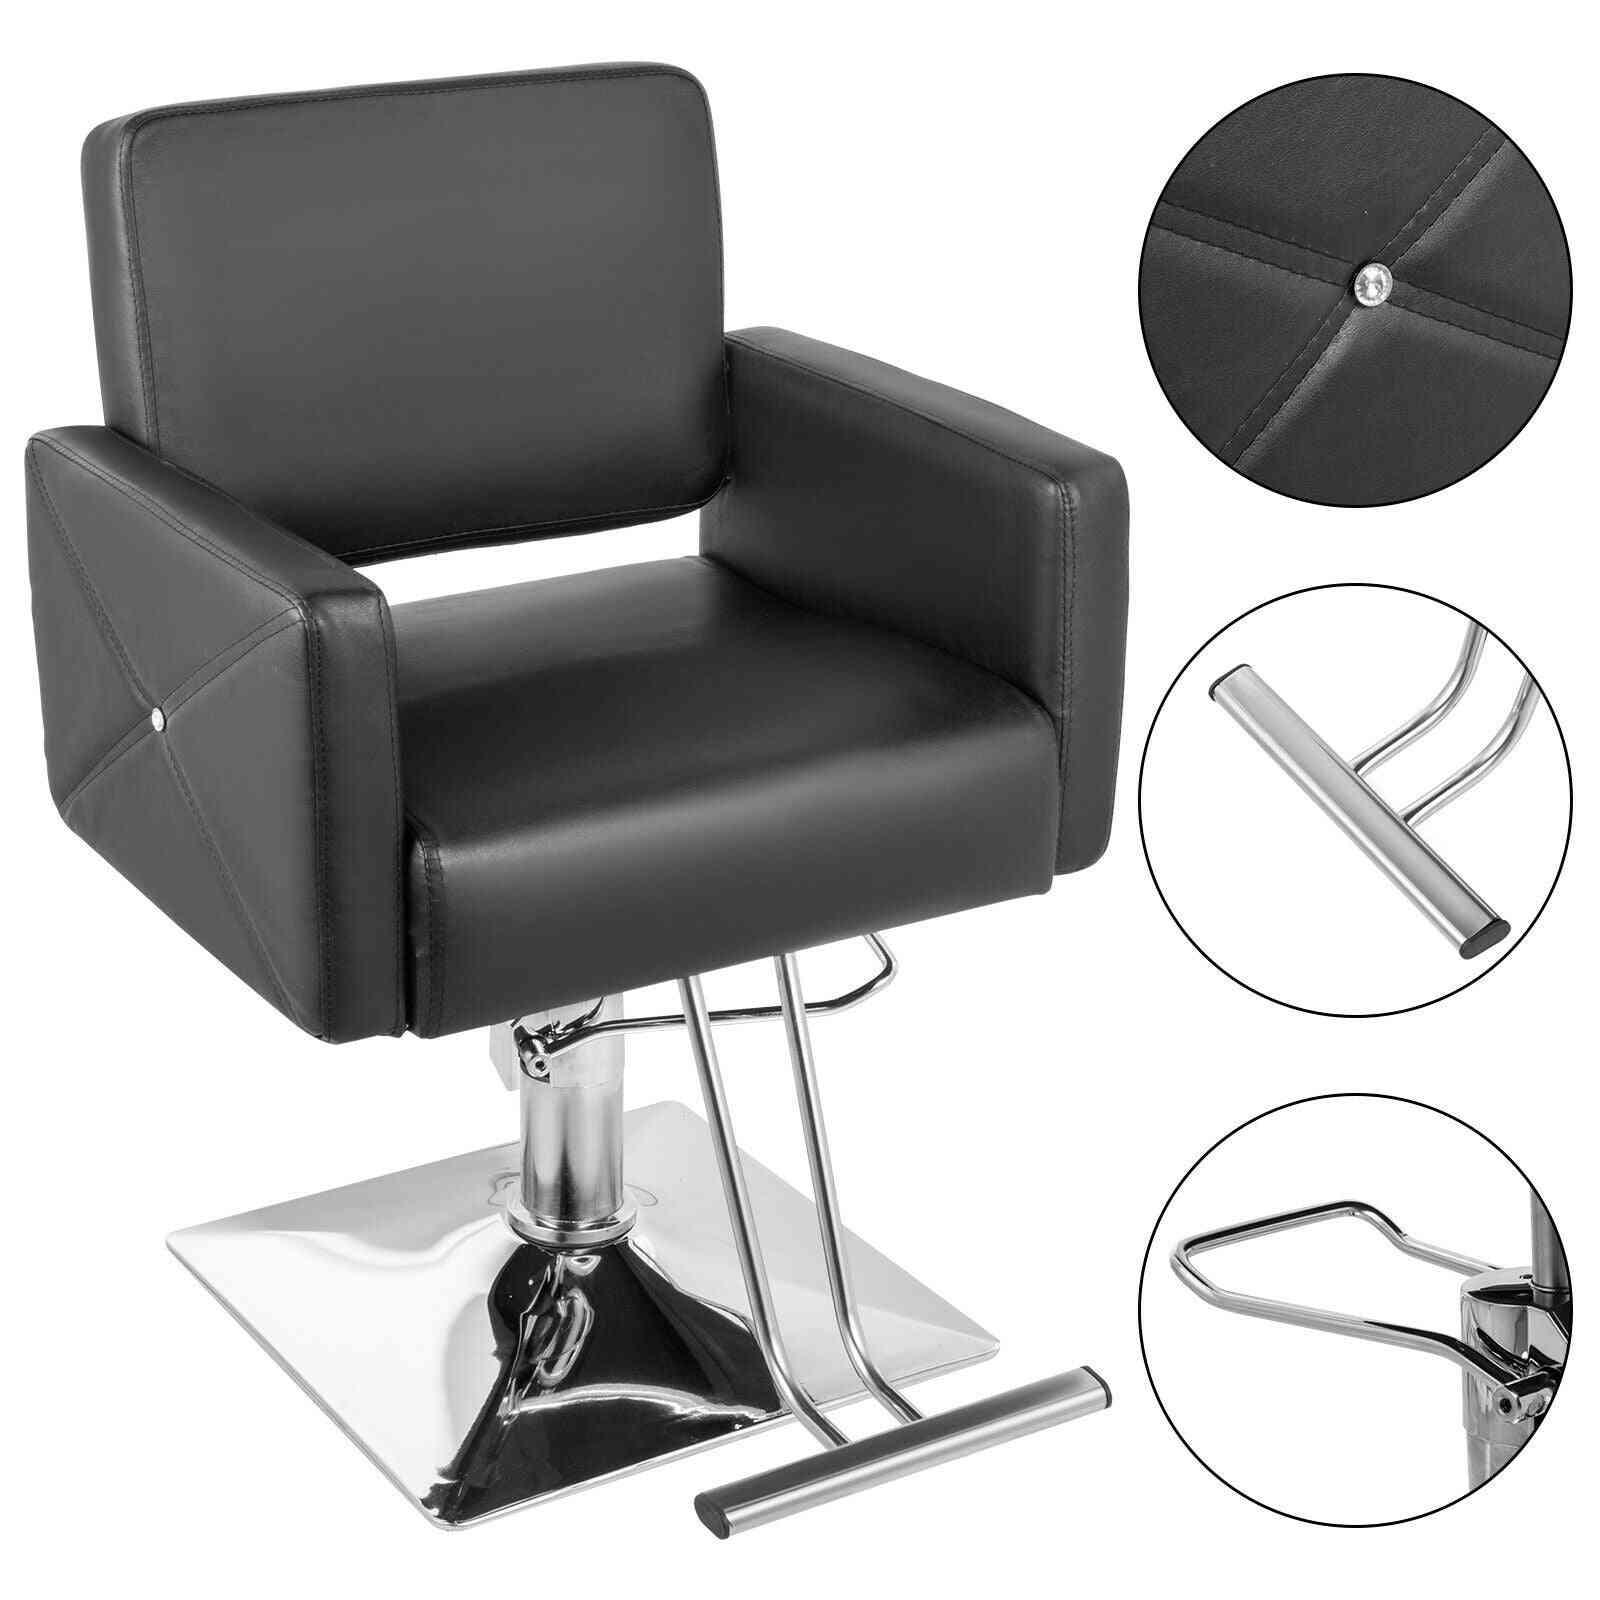 Hydraulic Barber Salon Chair, Spa Shampoo Stool